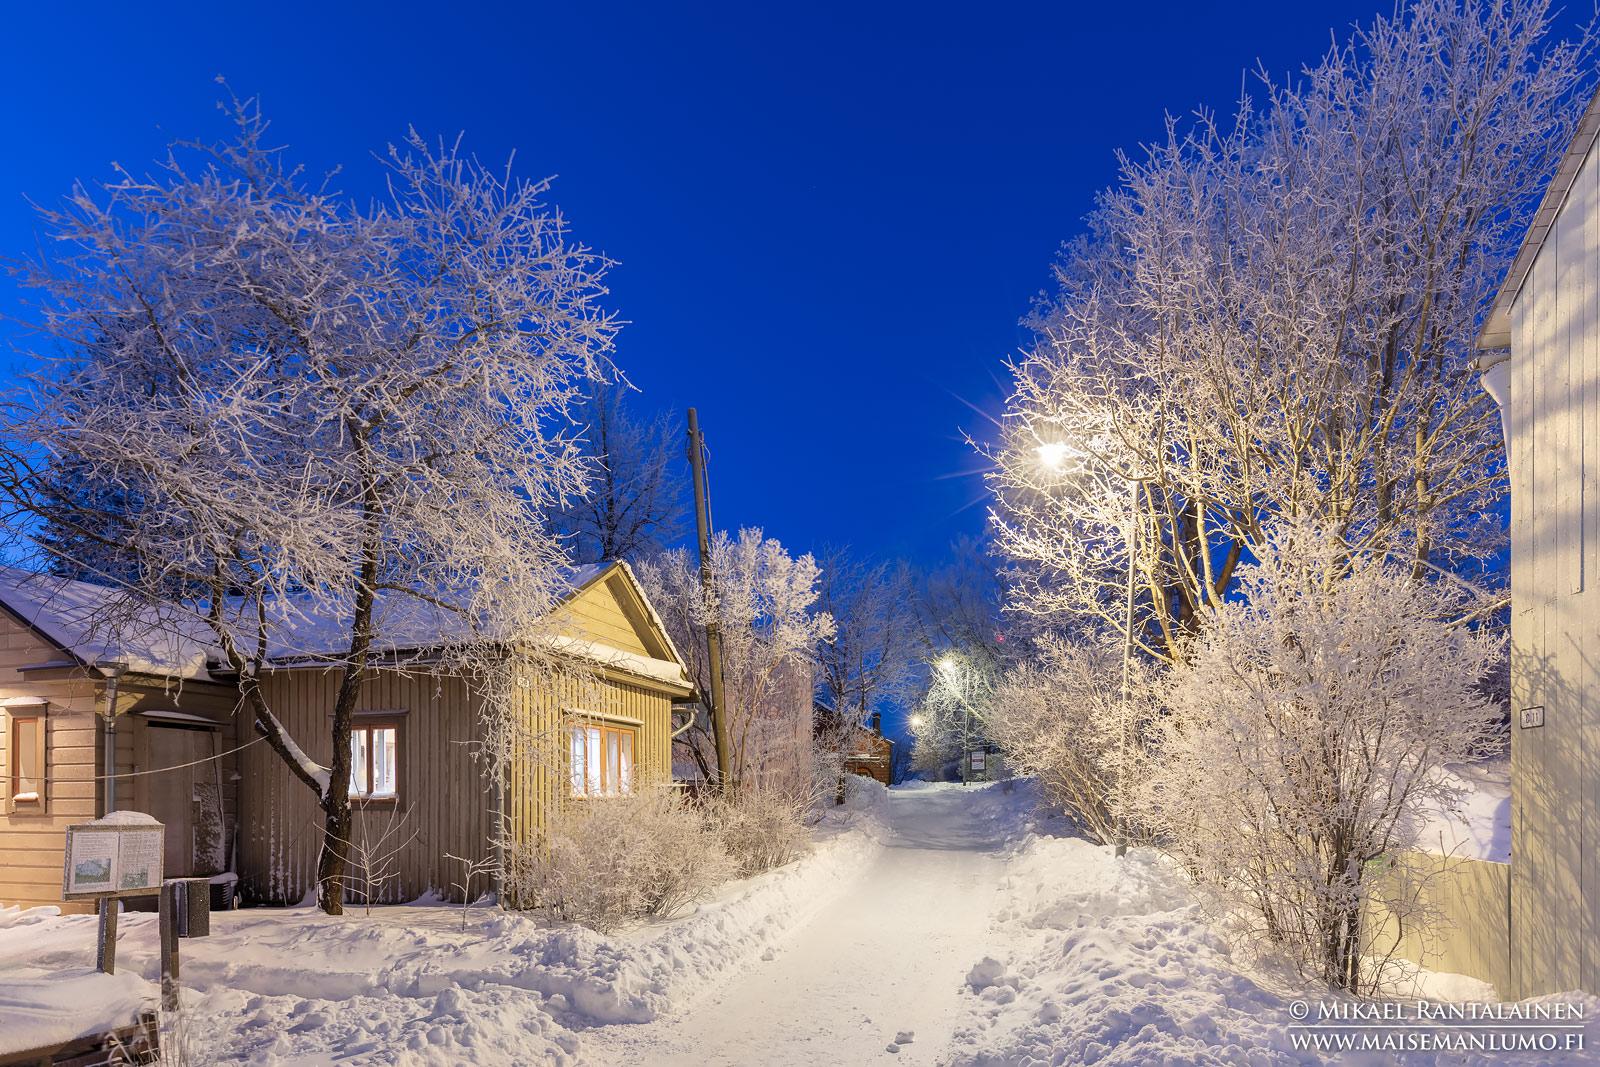 Huurteinen Suomenlinna, Helsinki